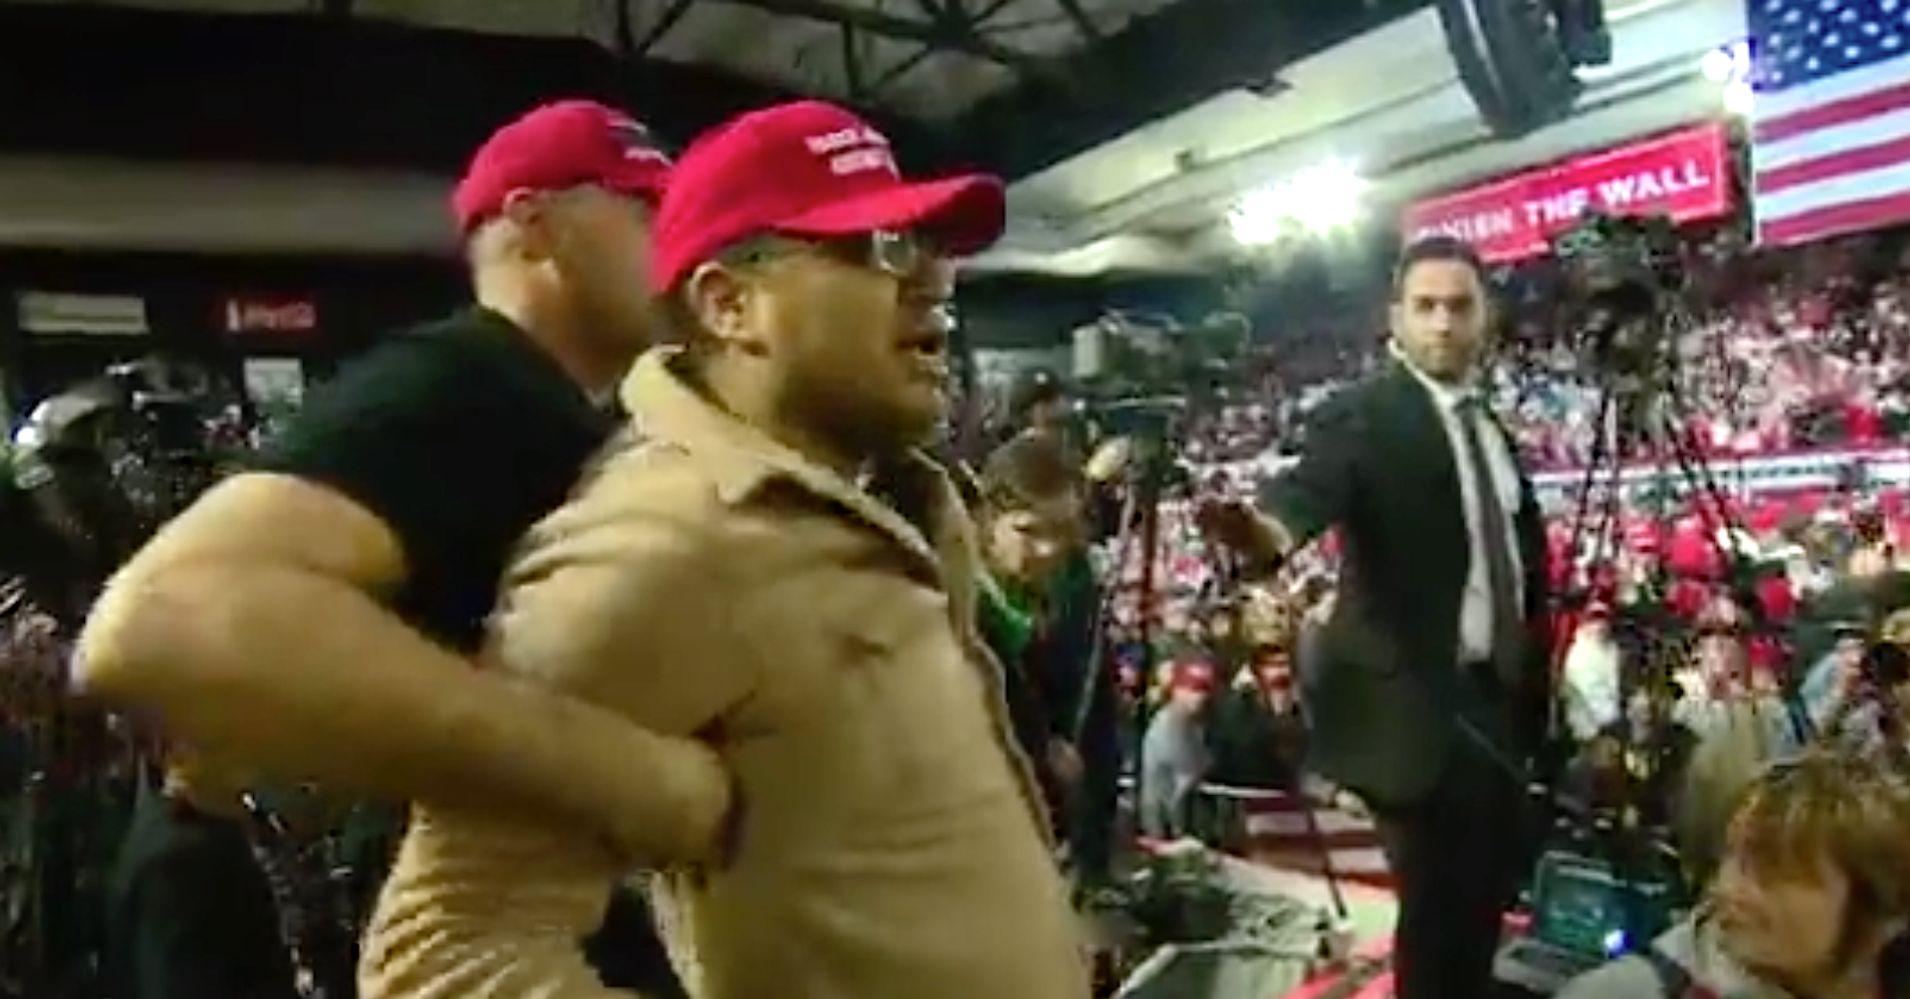 Trump Fan Launches 'Incredibly Violent Attack' On BBC Cameraman At El Paso Rally